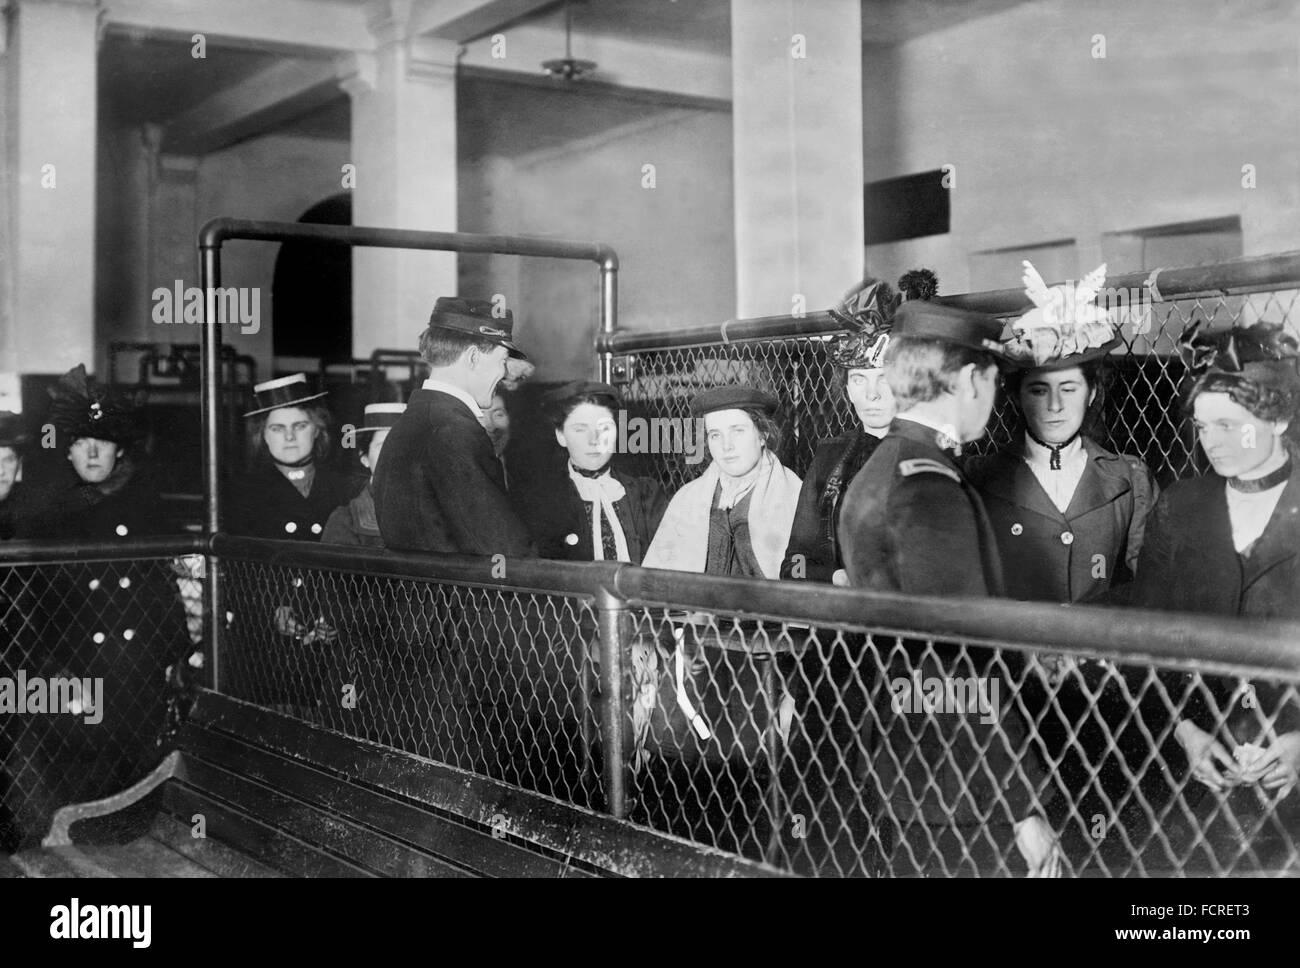 Immigrants At Ellis Island New York Ny Early 20th